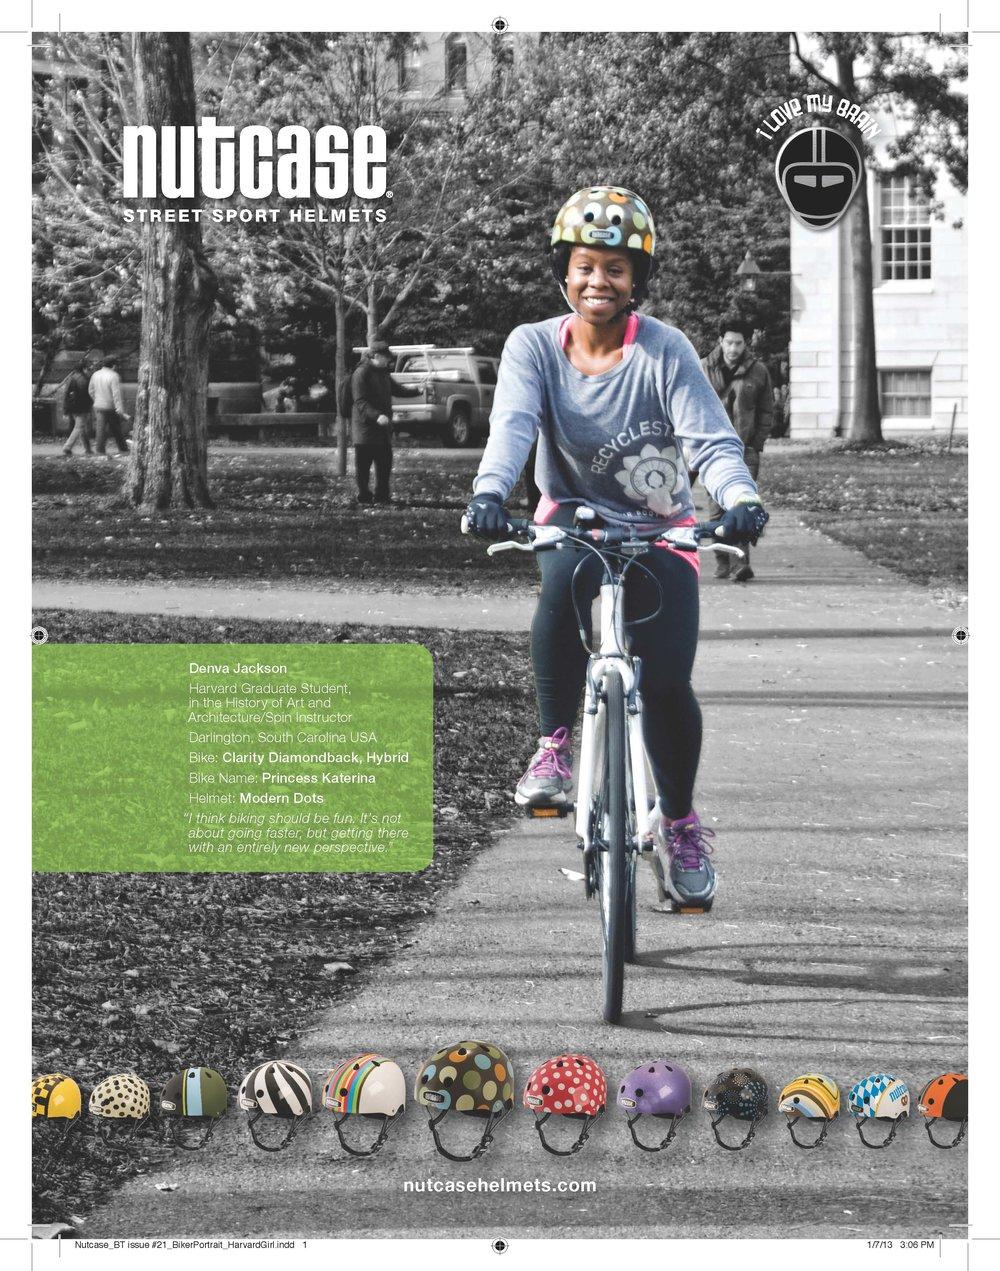 Nutcase_BT issue #21_BikerPortrait_HarvardGirl_hi.jpg